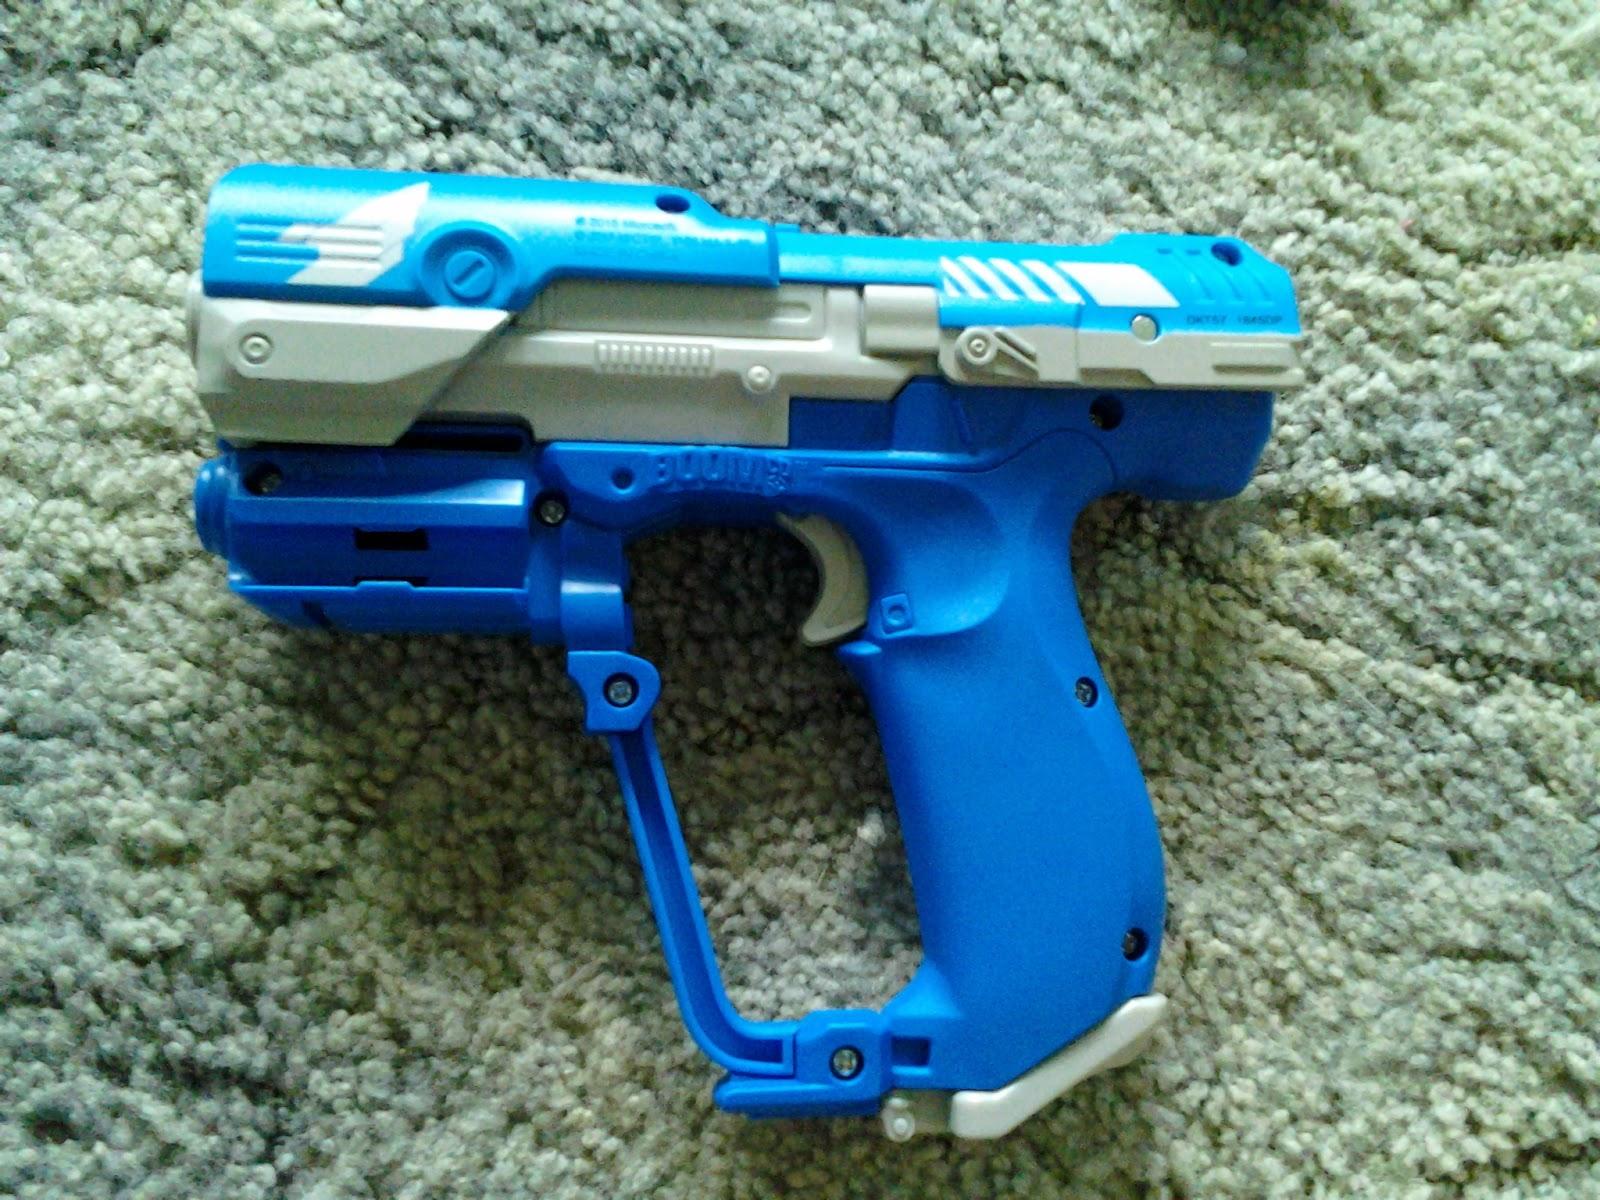 Boomco Halo Pistols Review